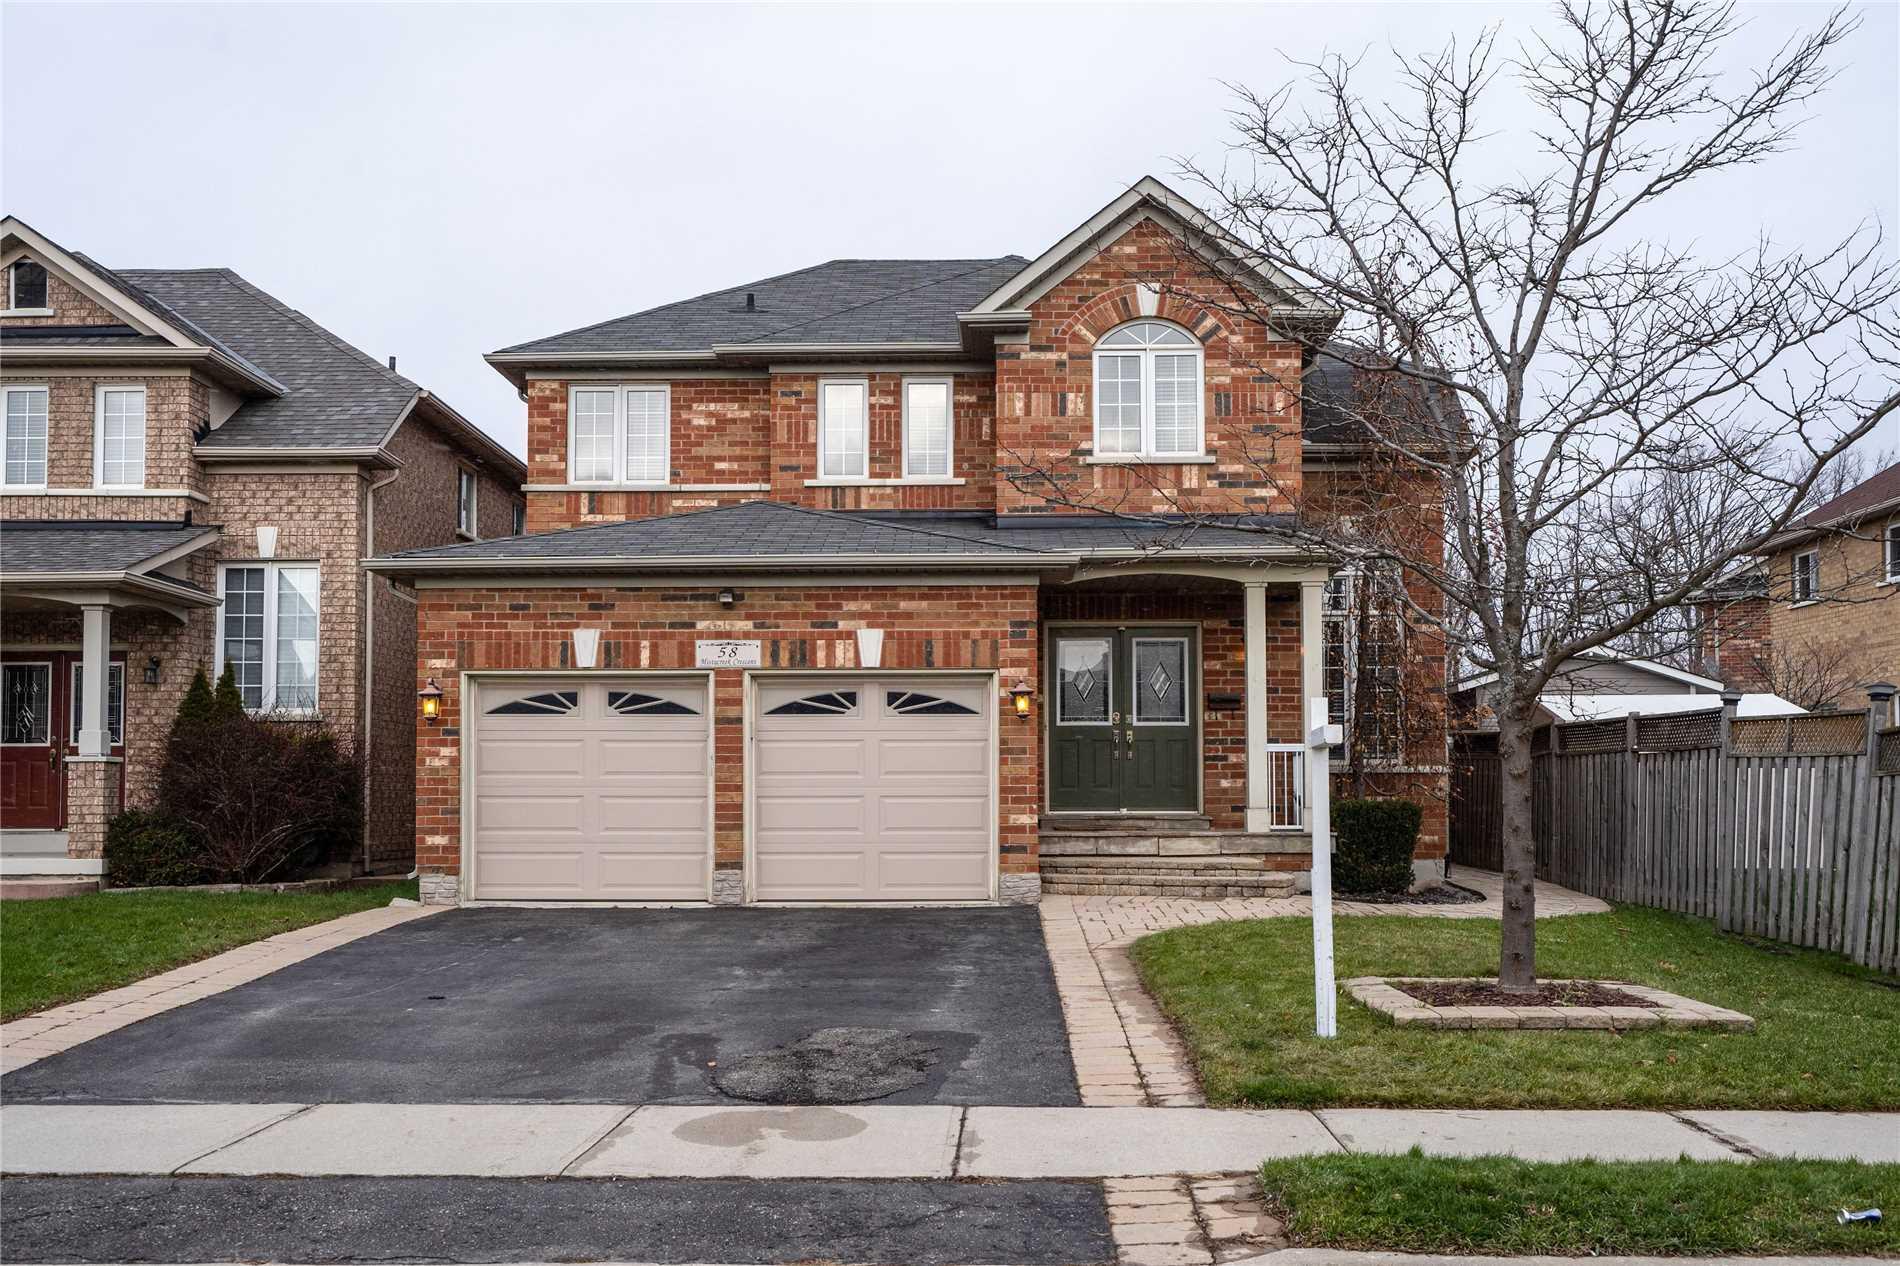 House for sale at 58 Mistycreek Crescent Brampton Ontario - MLS: W4312583